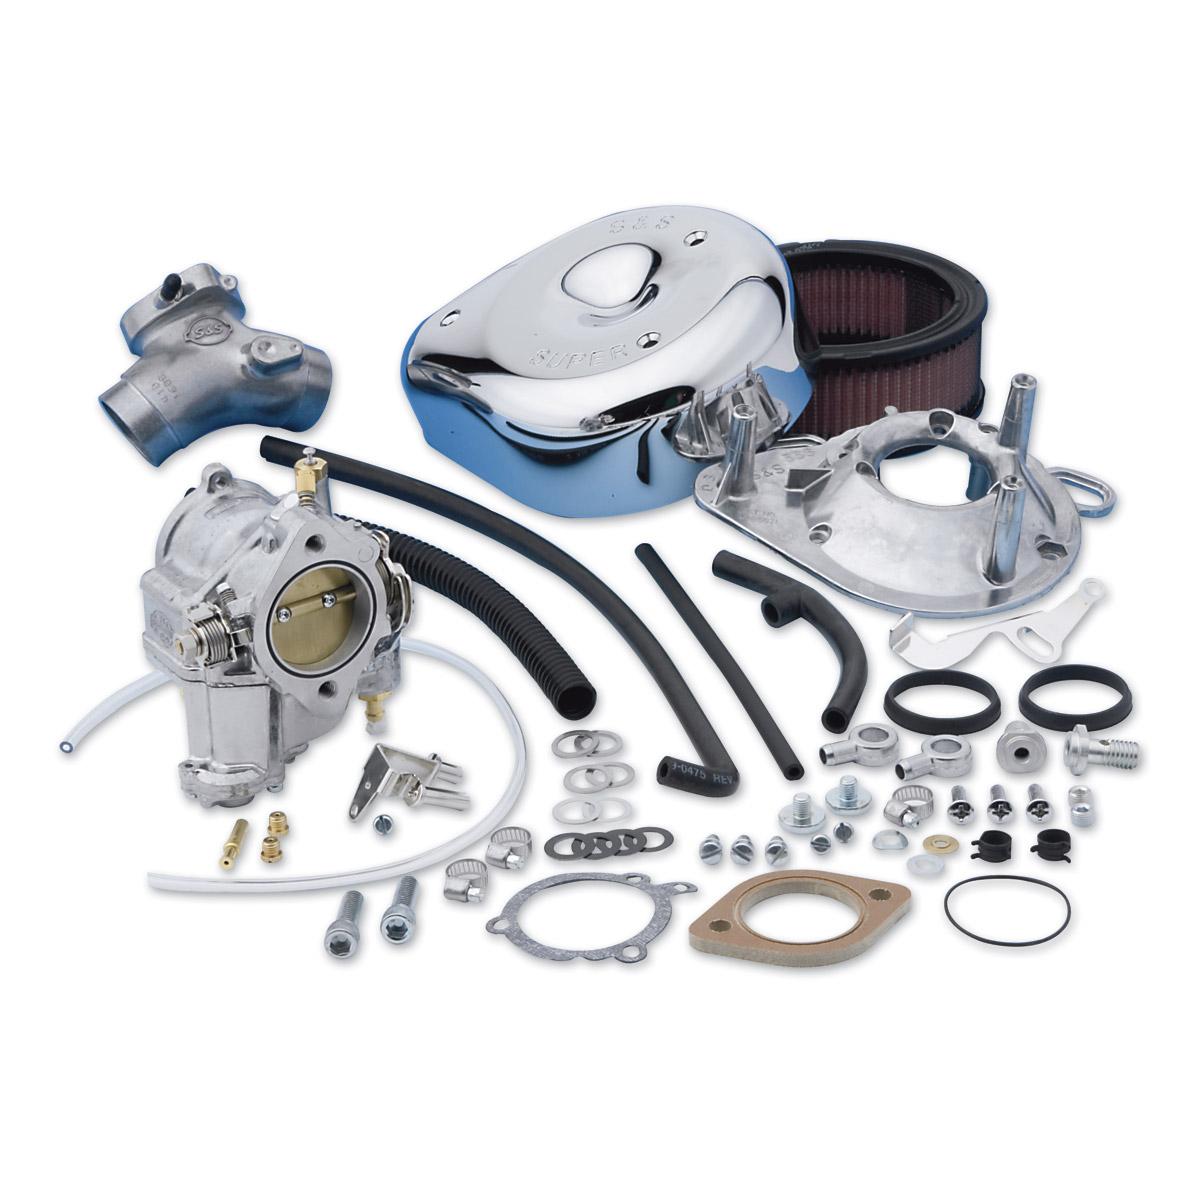 xl883c sportster 2005 harley davidson carburetor diagram